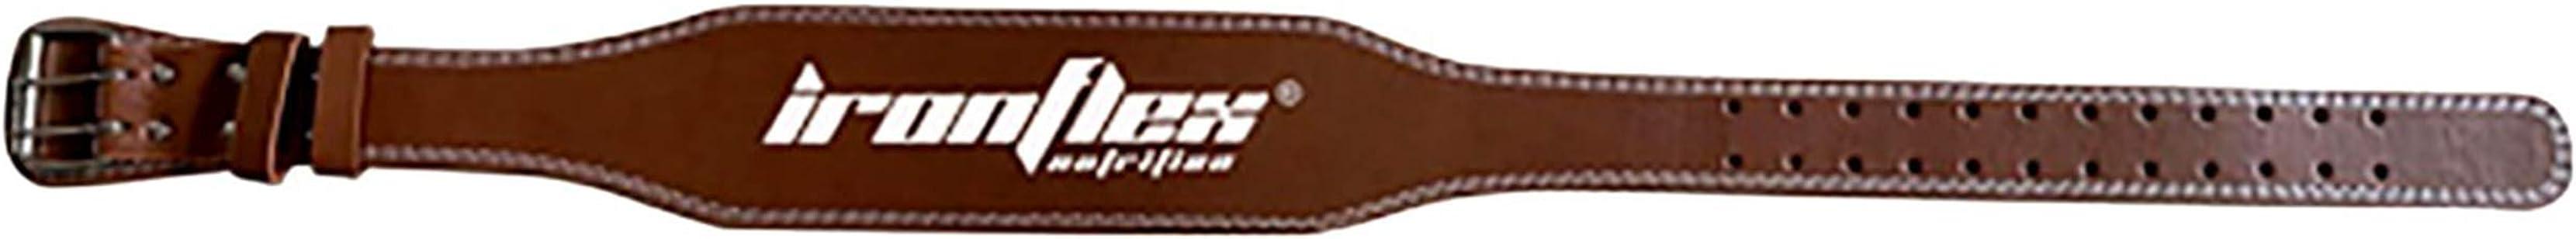 Cintura da allenamento palestra ironflex B08HQ6NL9V